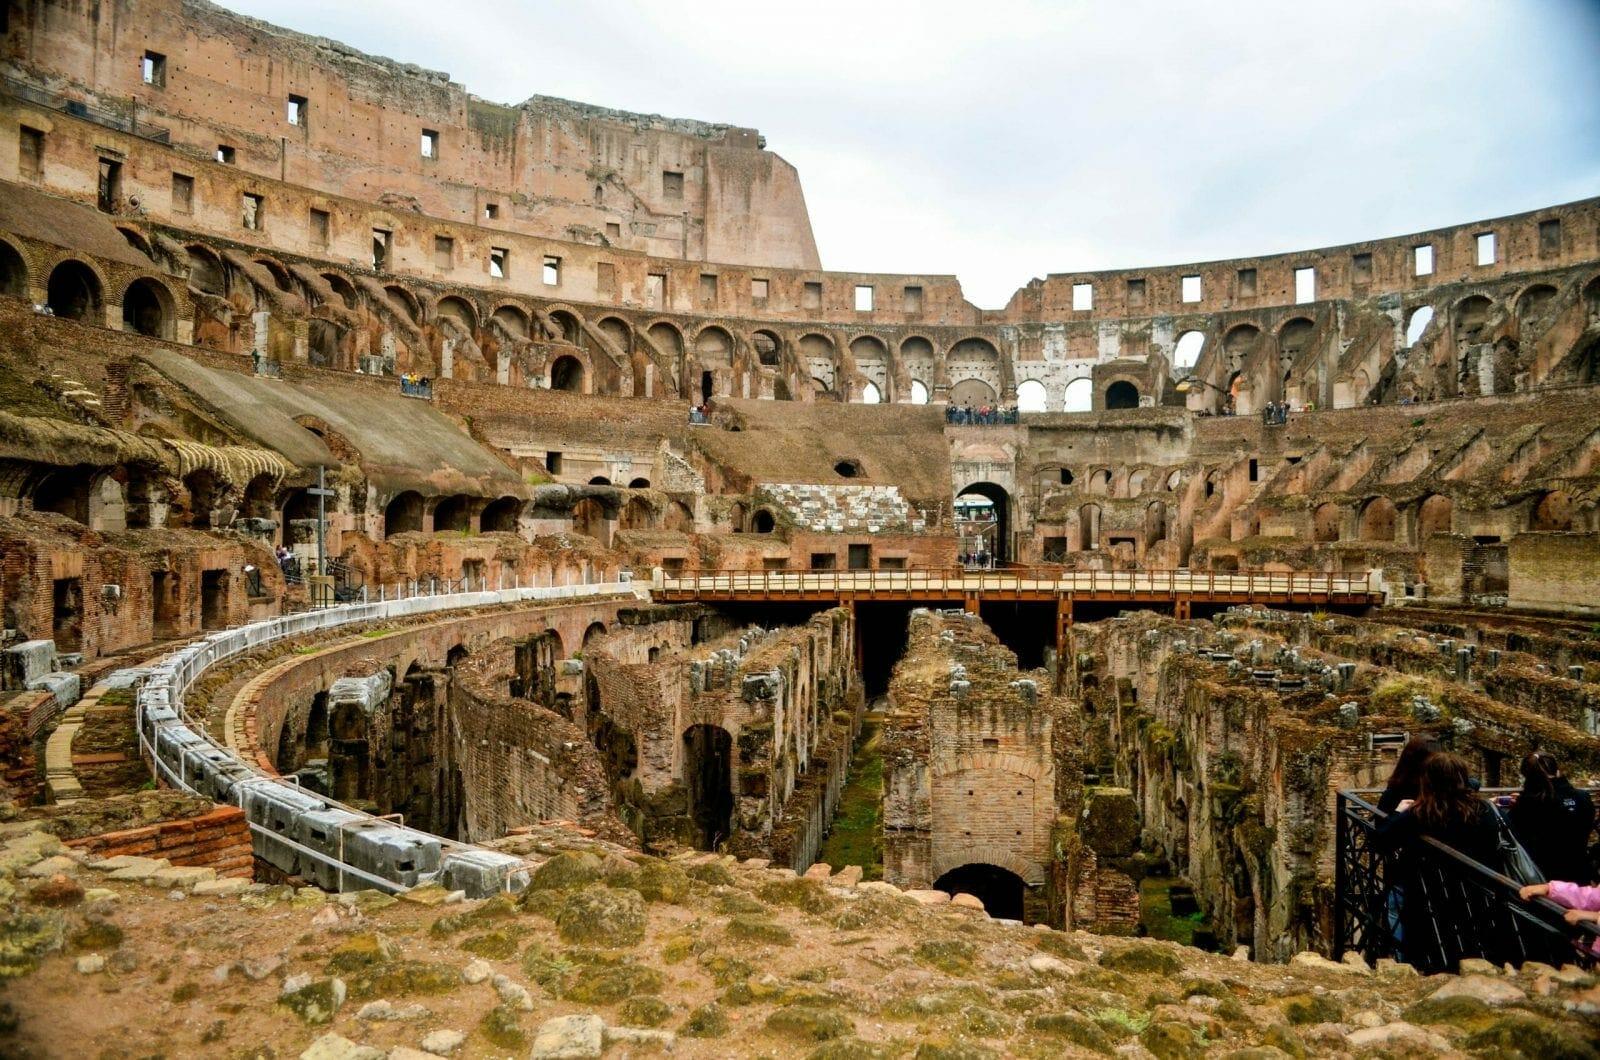 Rome Coliseum, Italy